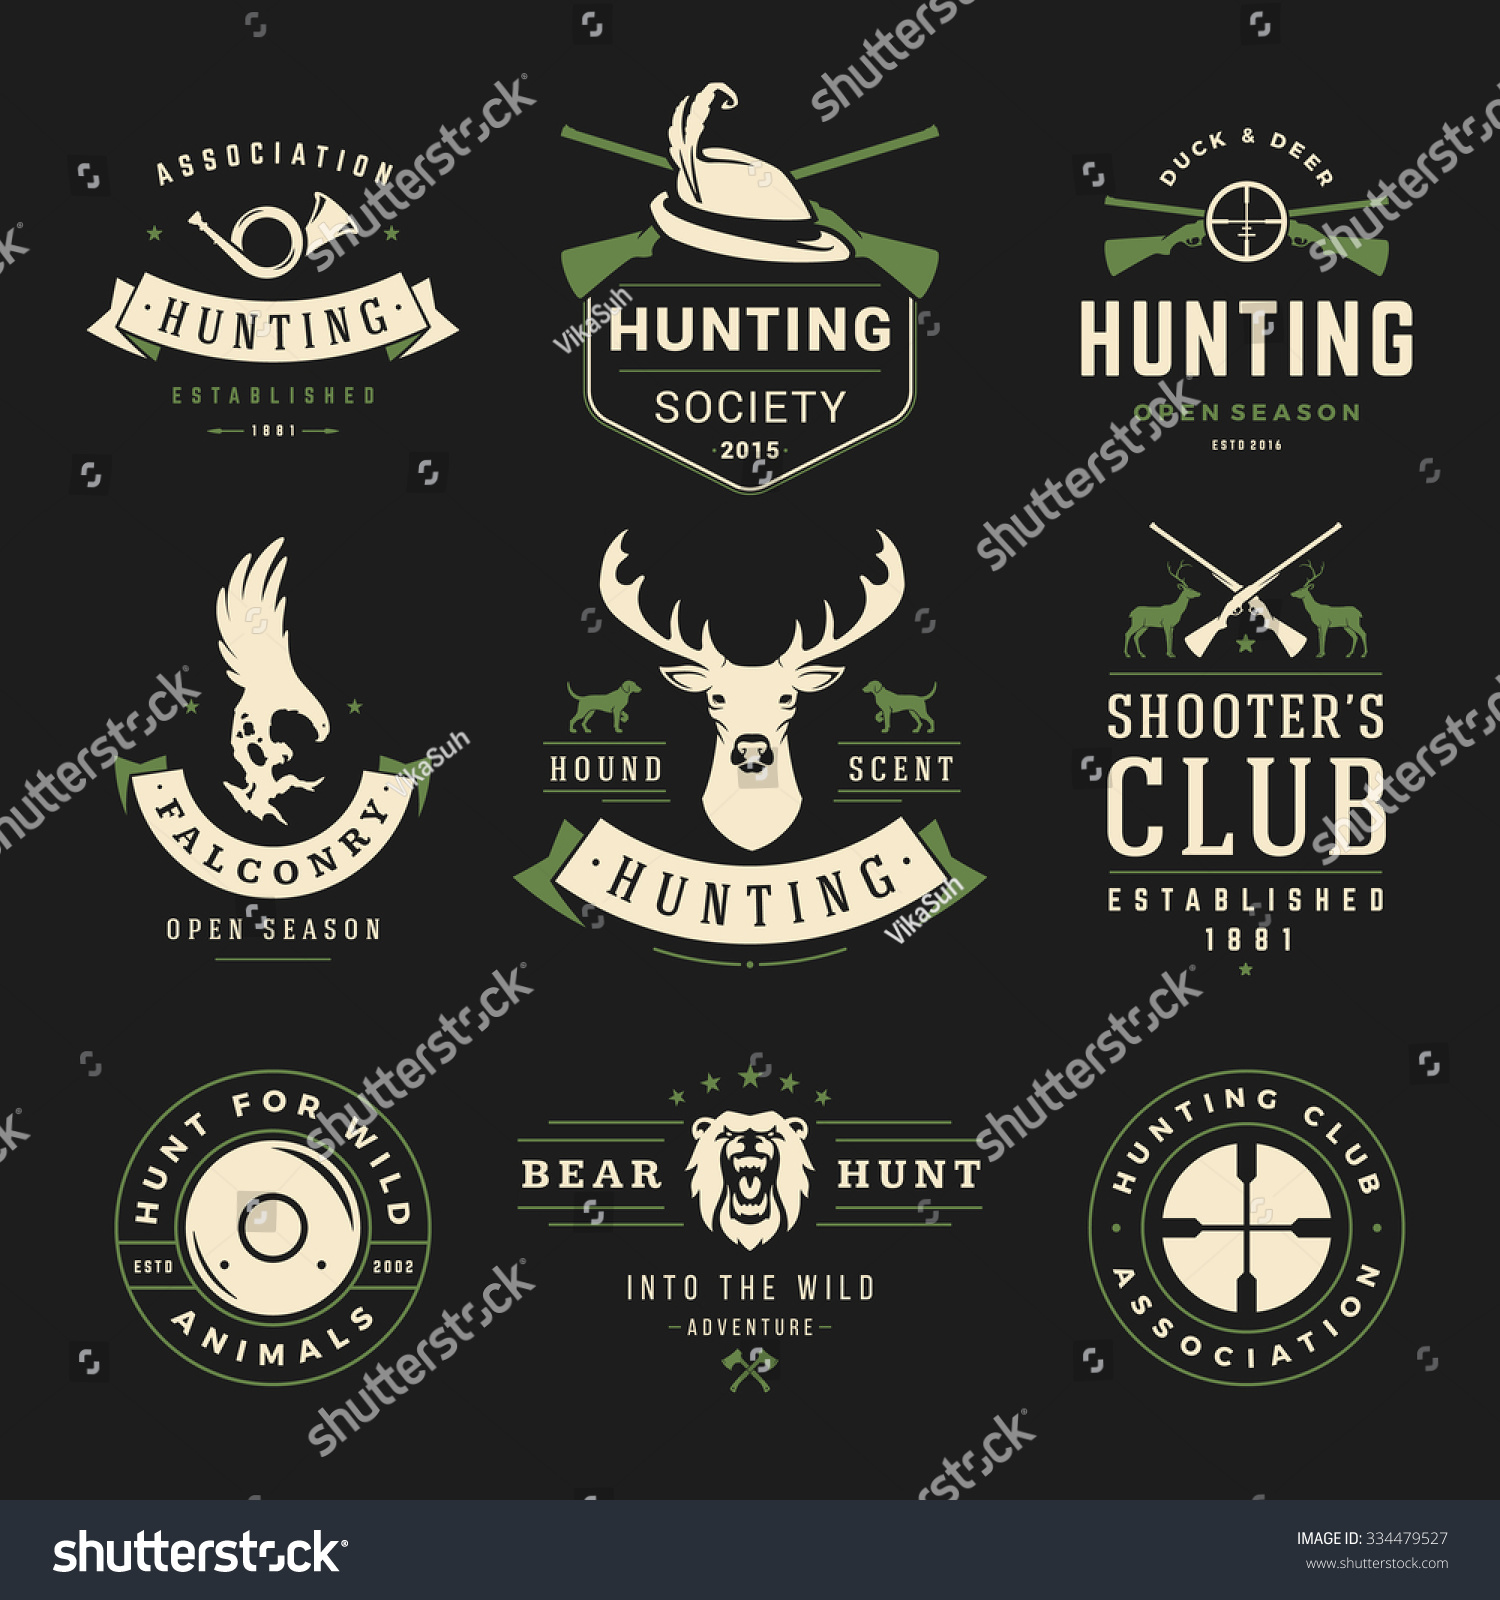 set hunting fishing labels badges logos stock vector  set of hunting and fishing labels badges logos vector design elements vintage style